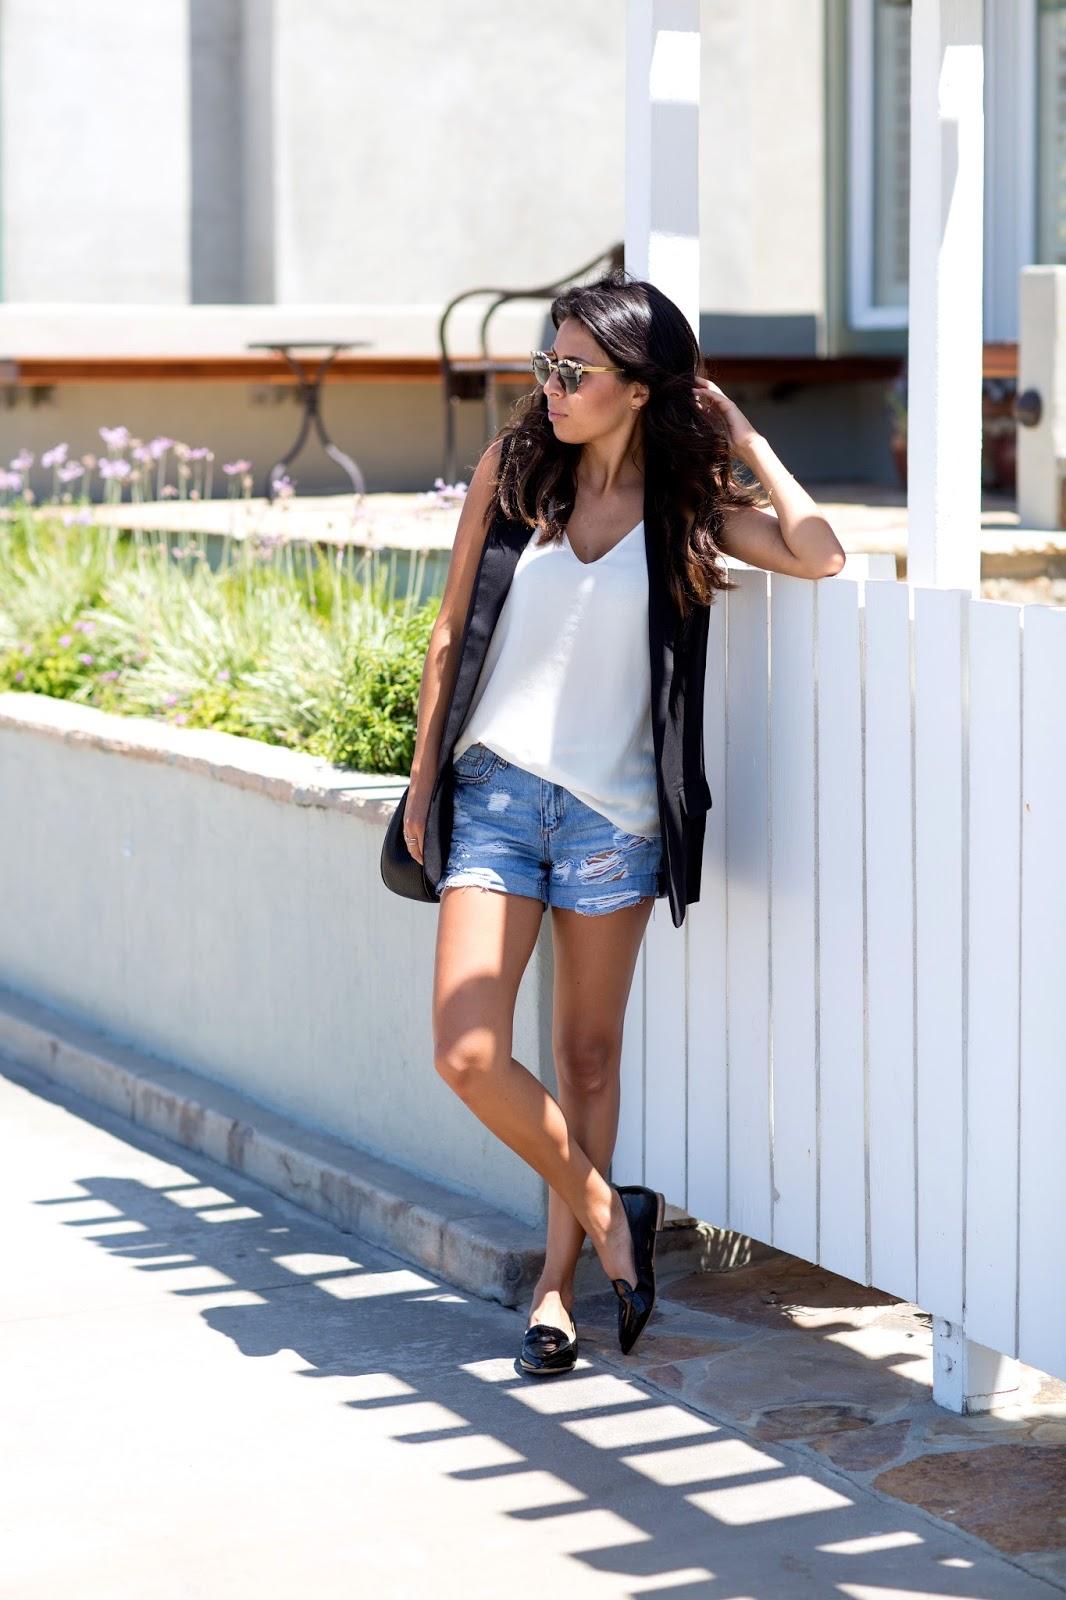 Summer-Outfits-3-1.jpg